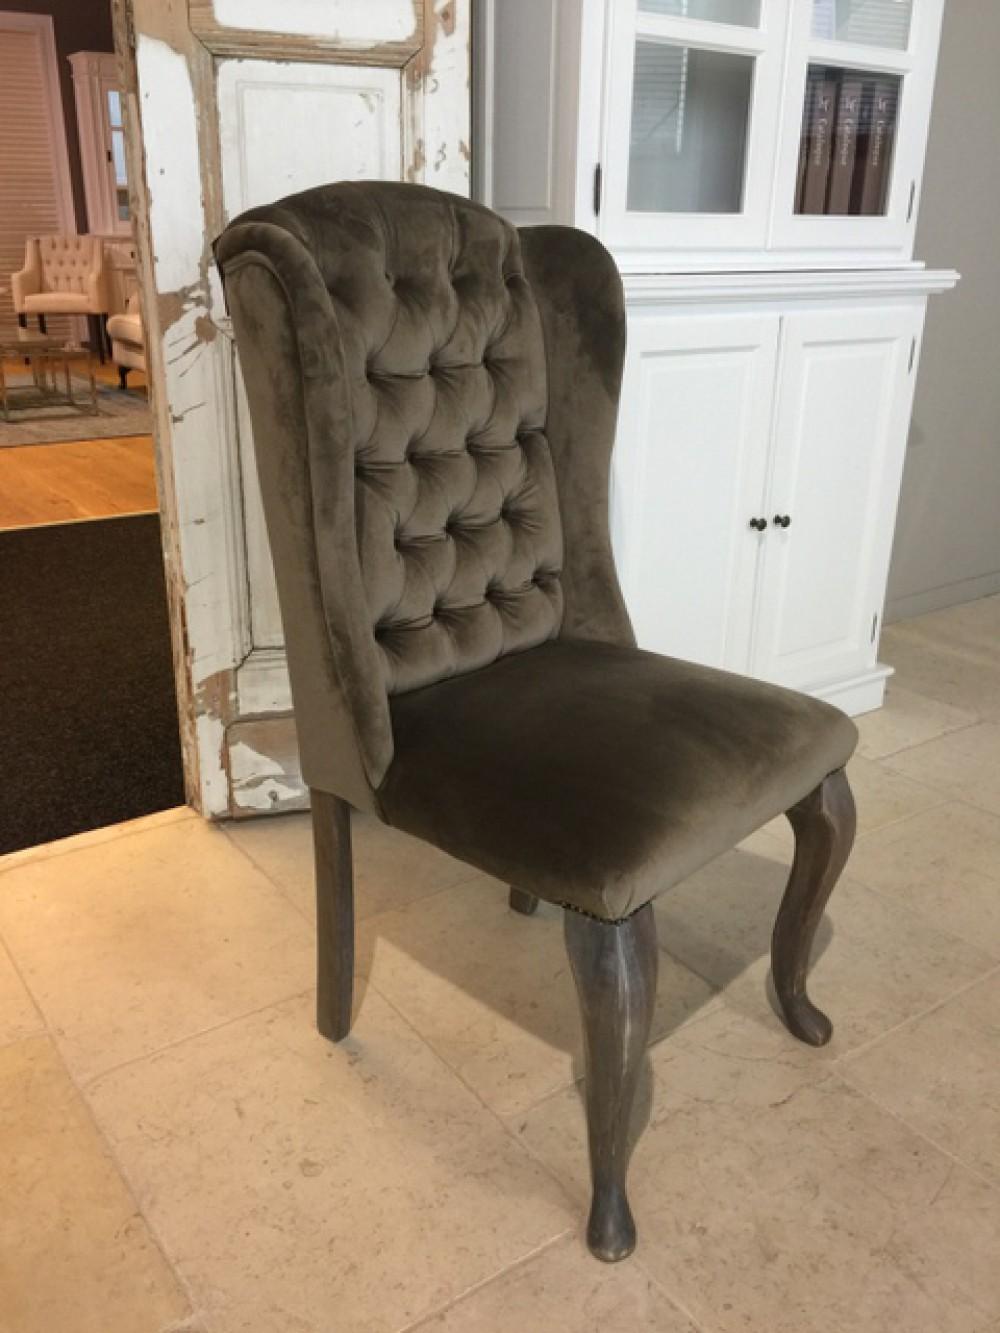 Stuhl braun gepolstert in verschiedenen farben stuhl mit ring stuhl chesterfield - Chesterfield stuhl ...